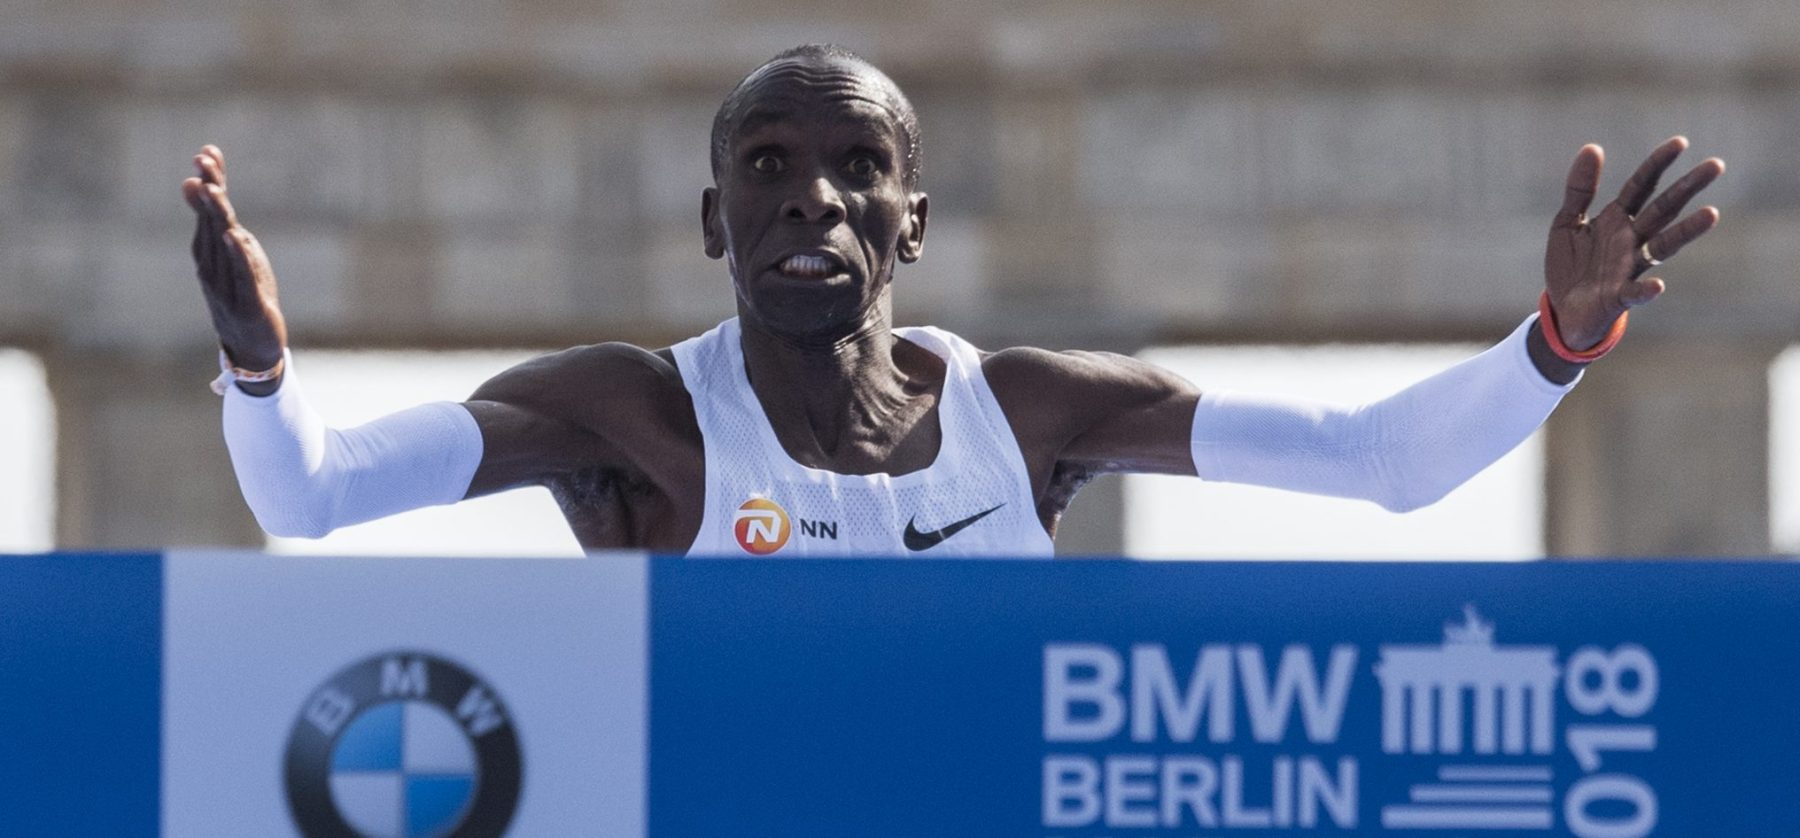 Kenya's Eliud Kipchoge sets a new marathon world record of 2:01.39 on September 16, 2018 in Berlin. (Photo credit: JOHN MACDOUGALL/AFP/Getty Images)